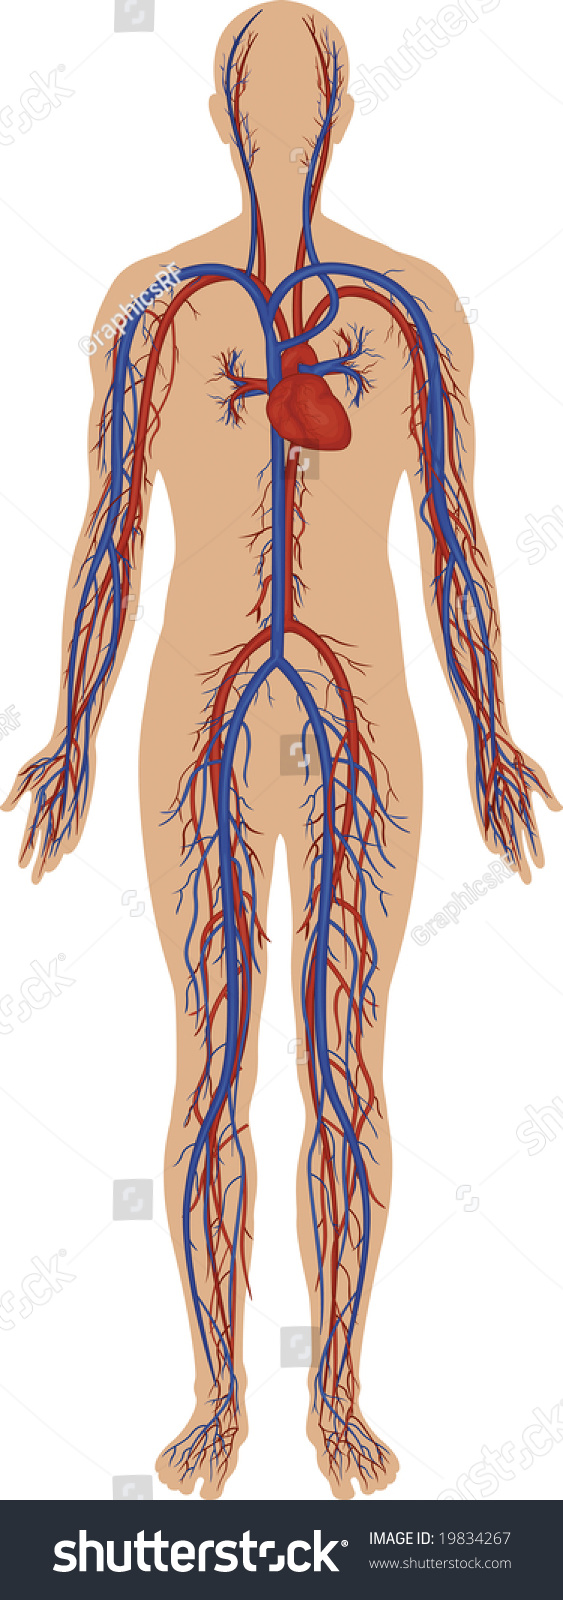 High Detail Illustration Human Circulatory System Stock Illustration